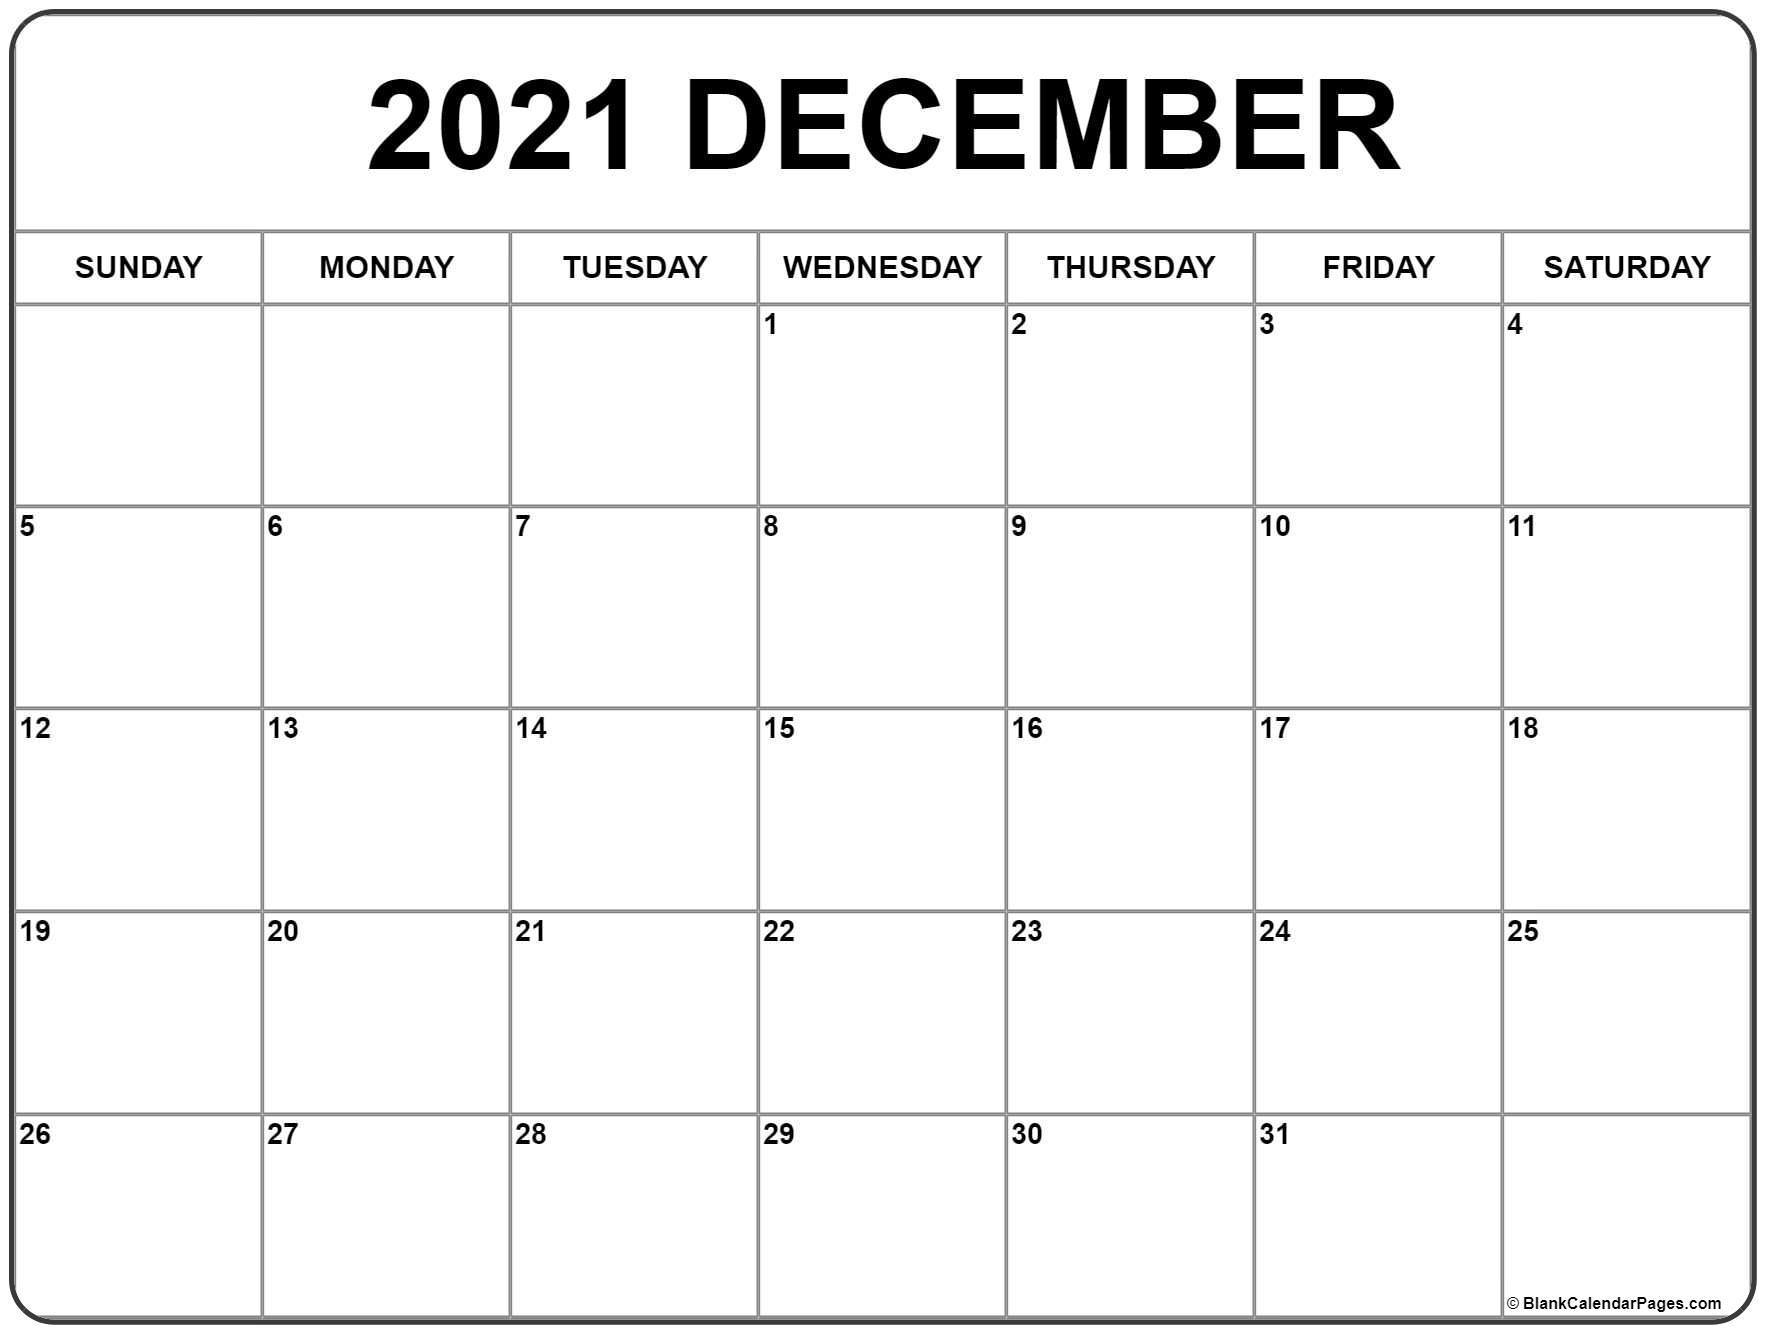 December 2021 Calendar   Free Printable Monthly Calendars